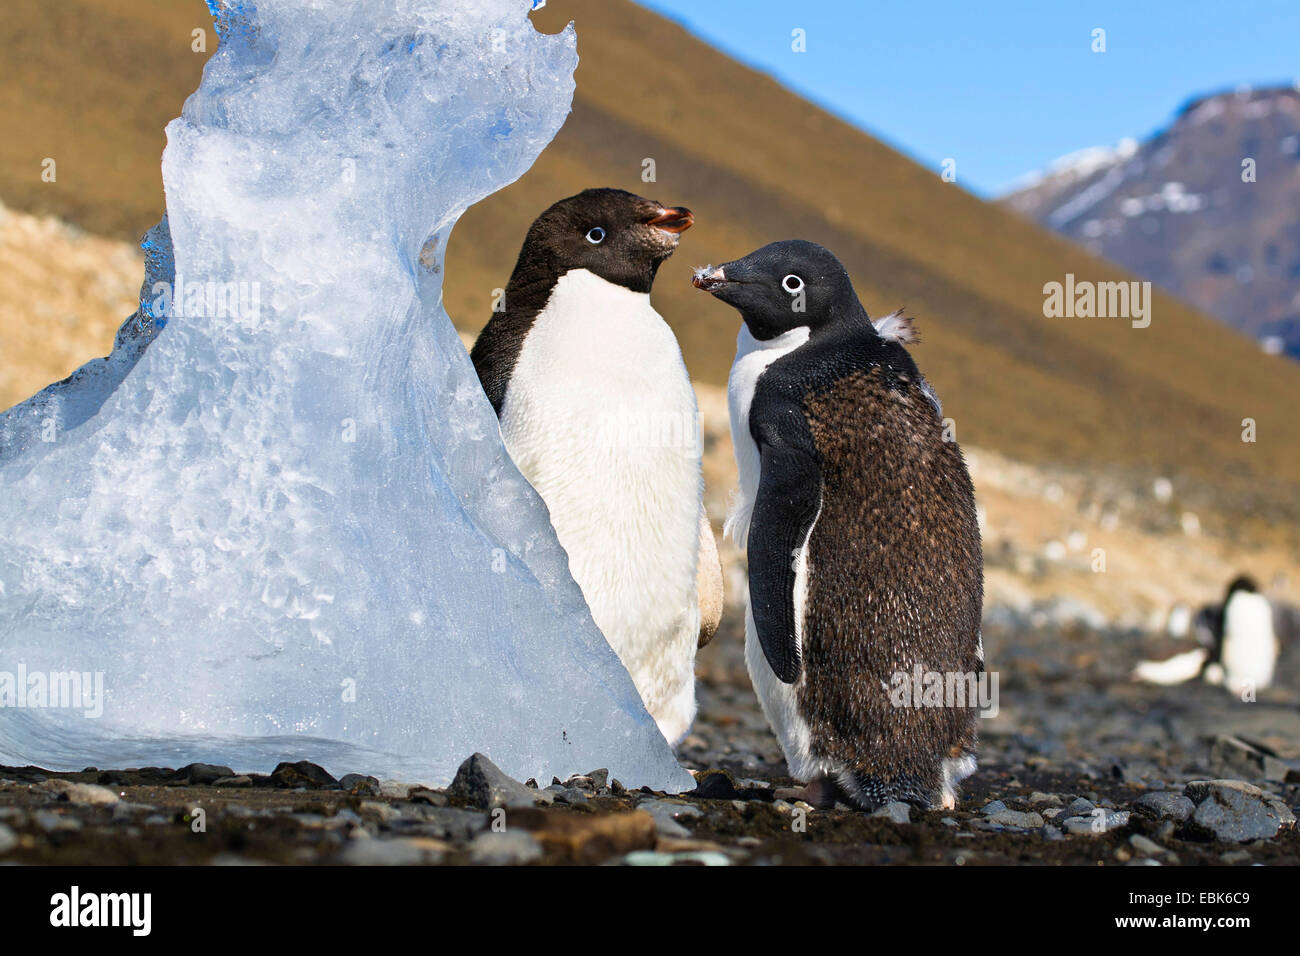 Pingüinos Adelia (Pygoscelis adeliae), dos jóvenes pingüinos Adelie muda, la Antártida, Isla Imagen De Stock